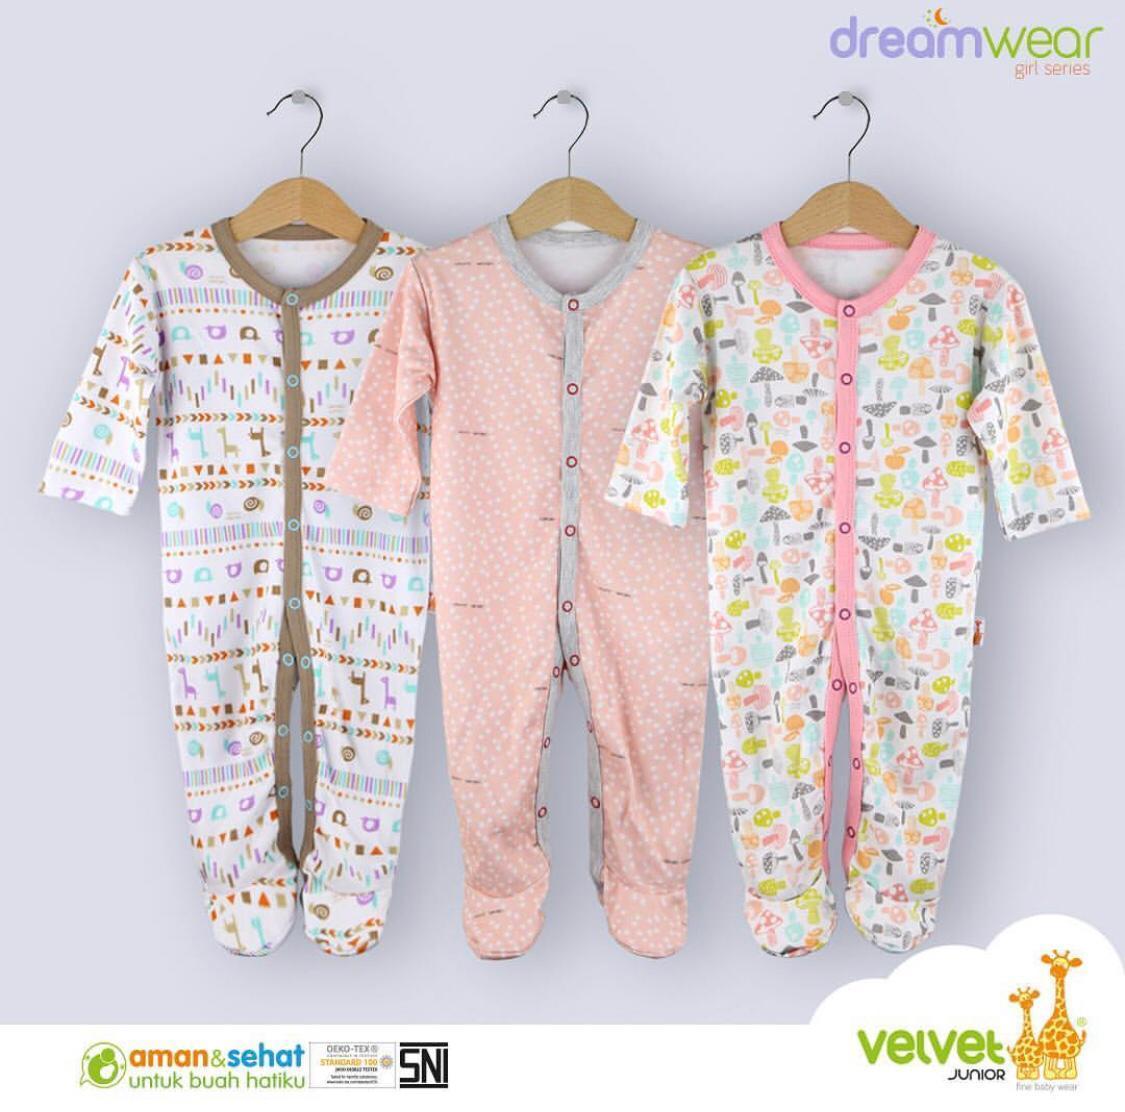 VELVET DREAM WEAR 3pcs Sleepsuit (Girl) PREMIUM Quality BigBabyShop